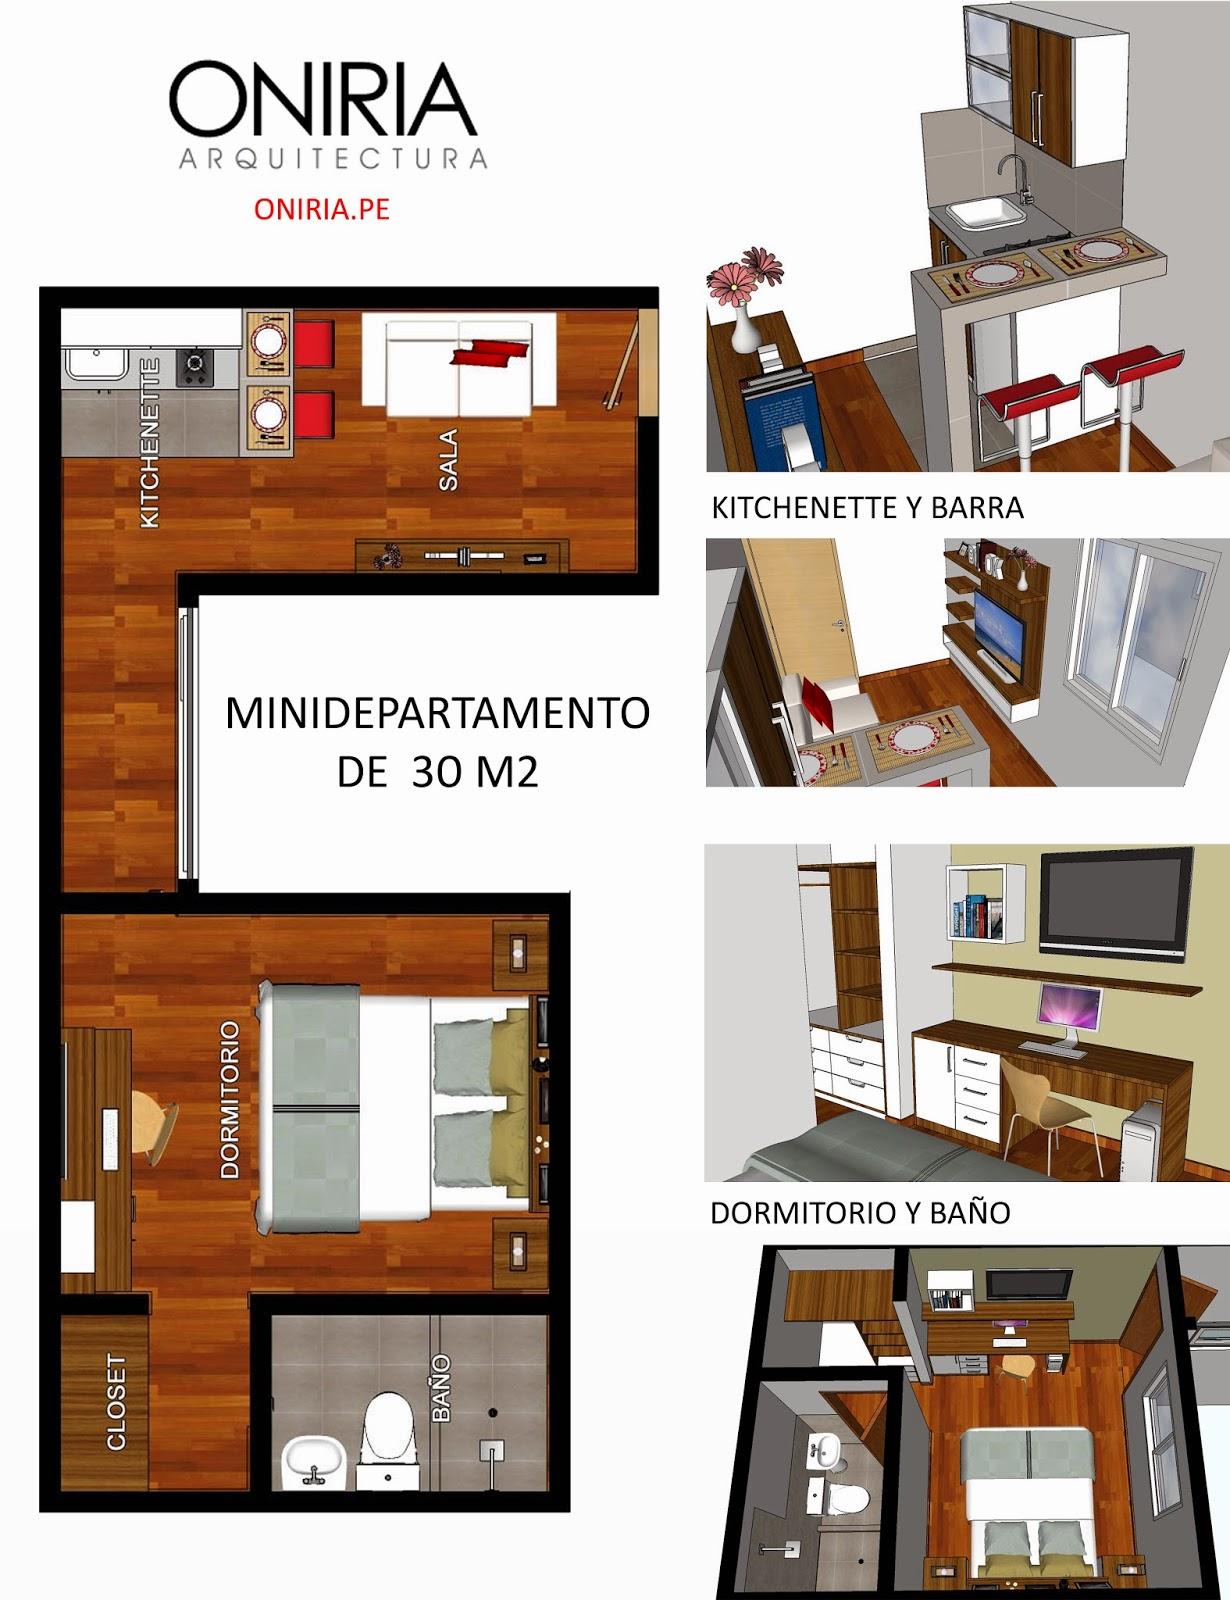 Oniria dise o de minidepartamento de 30 m2 for Diseno minidepartamento